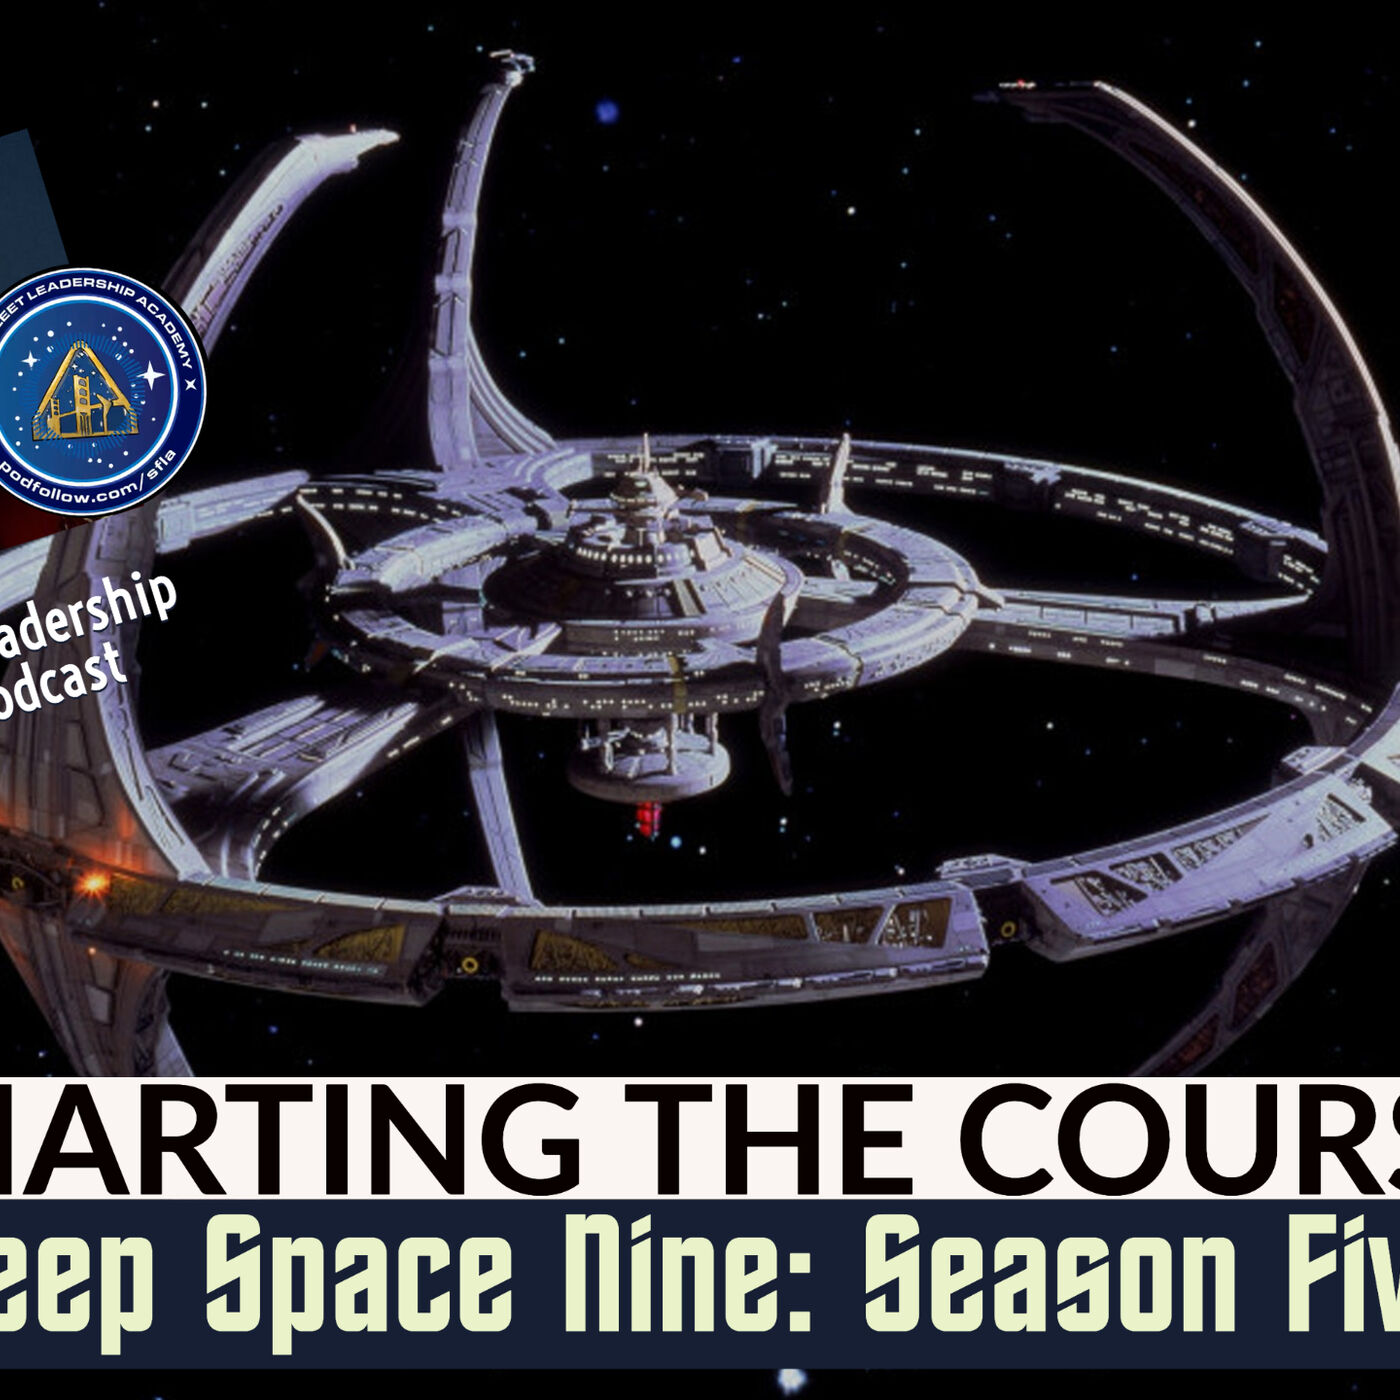 Charting the Course - Star Trek: Deep Space Nine Season 5